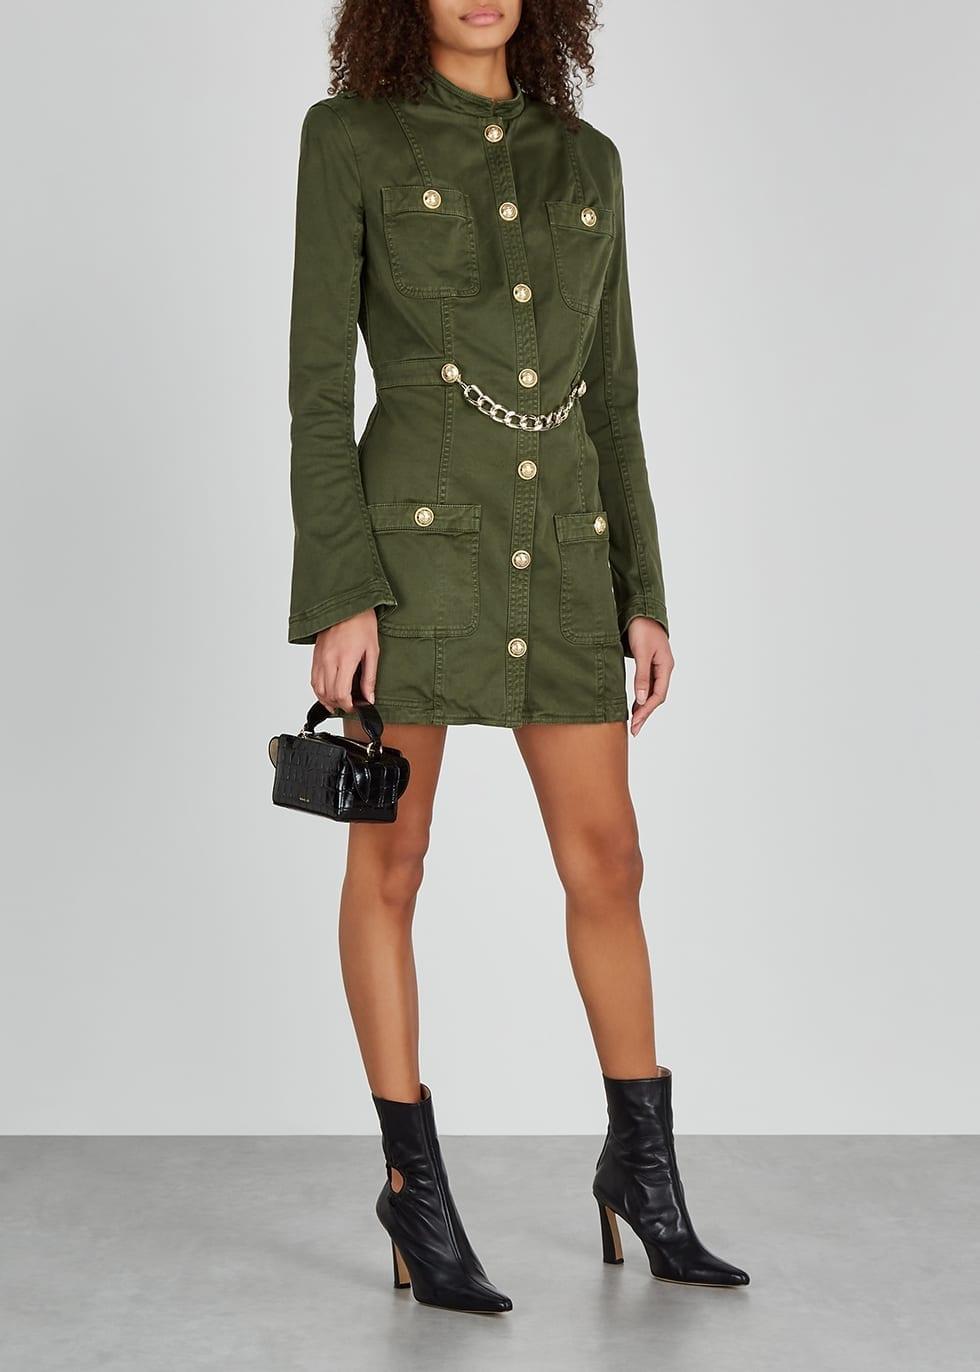 BALMAIN Army Green Stretch-denim Mini Dress